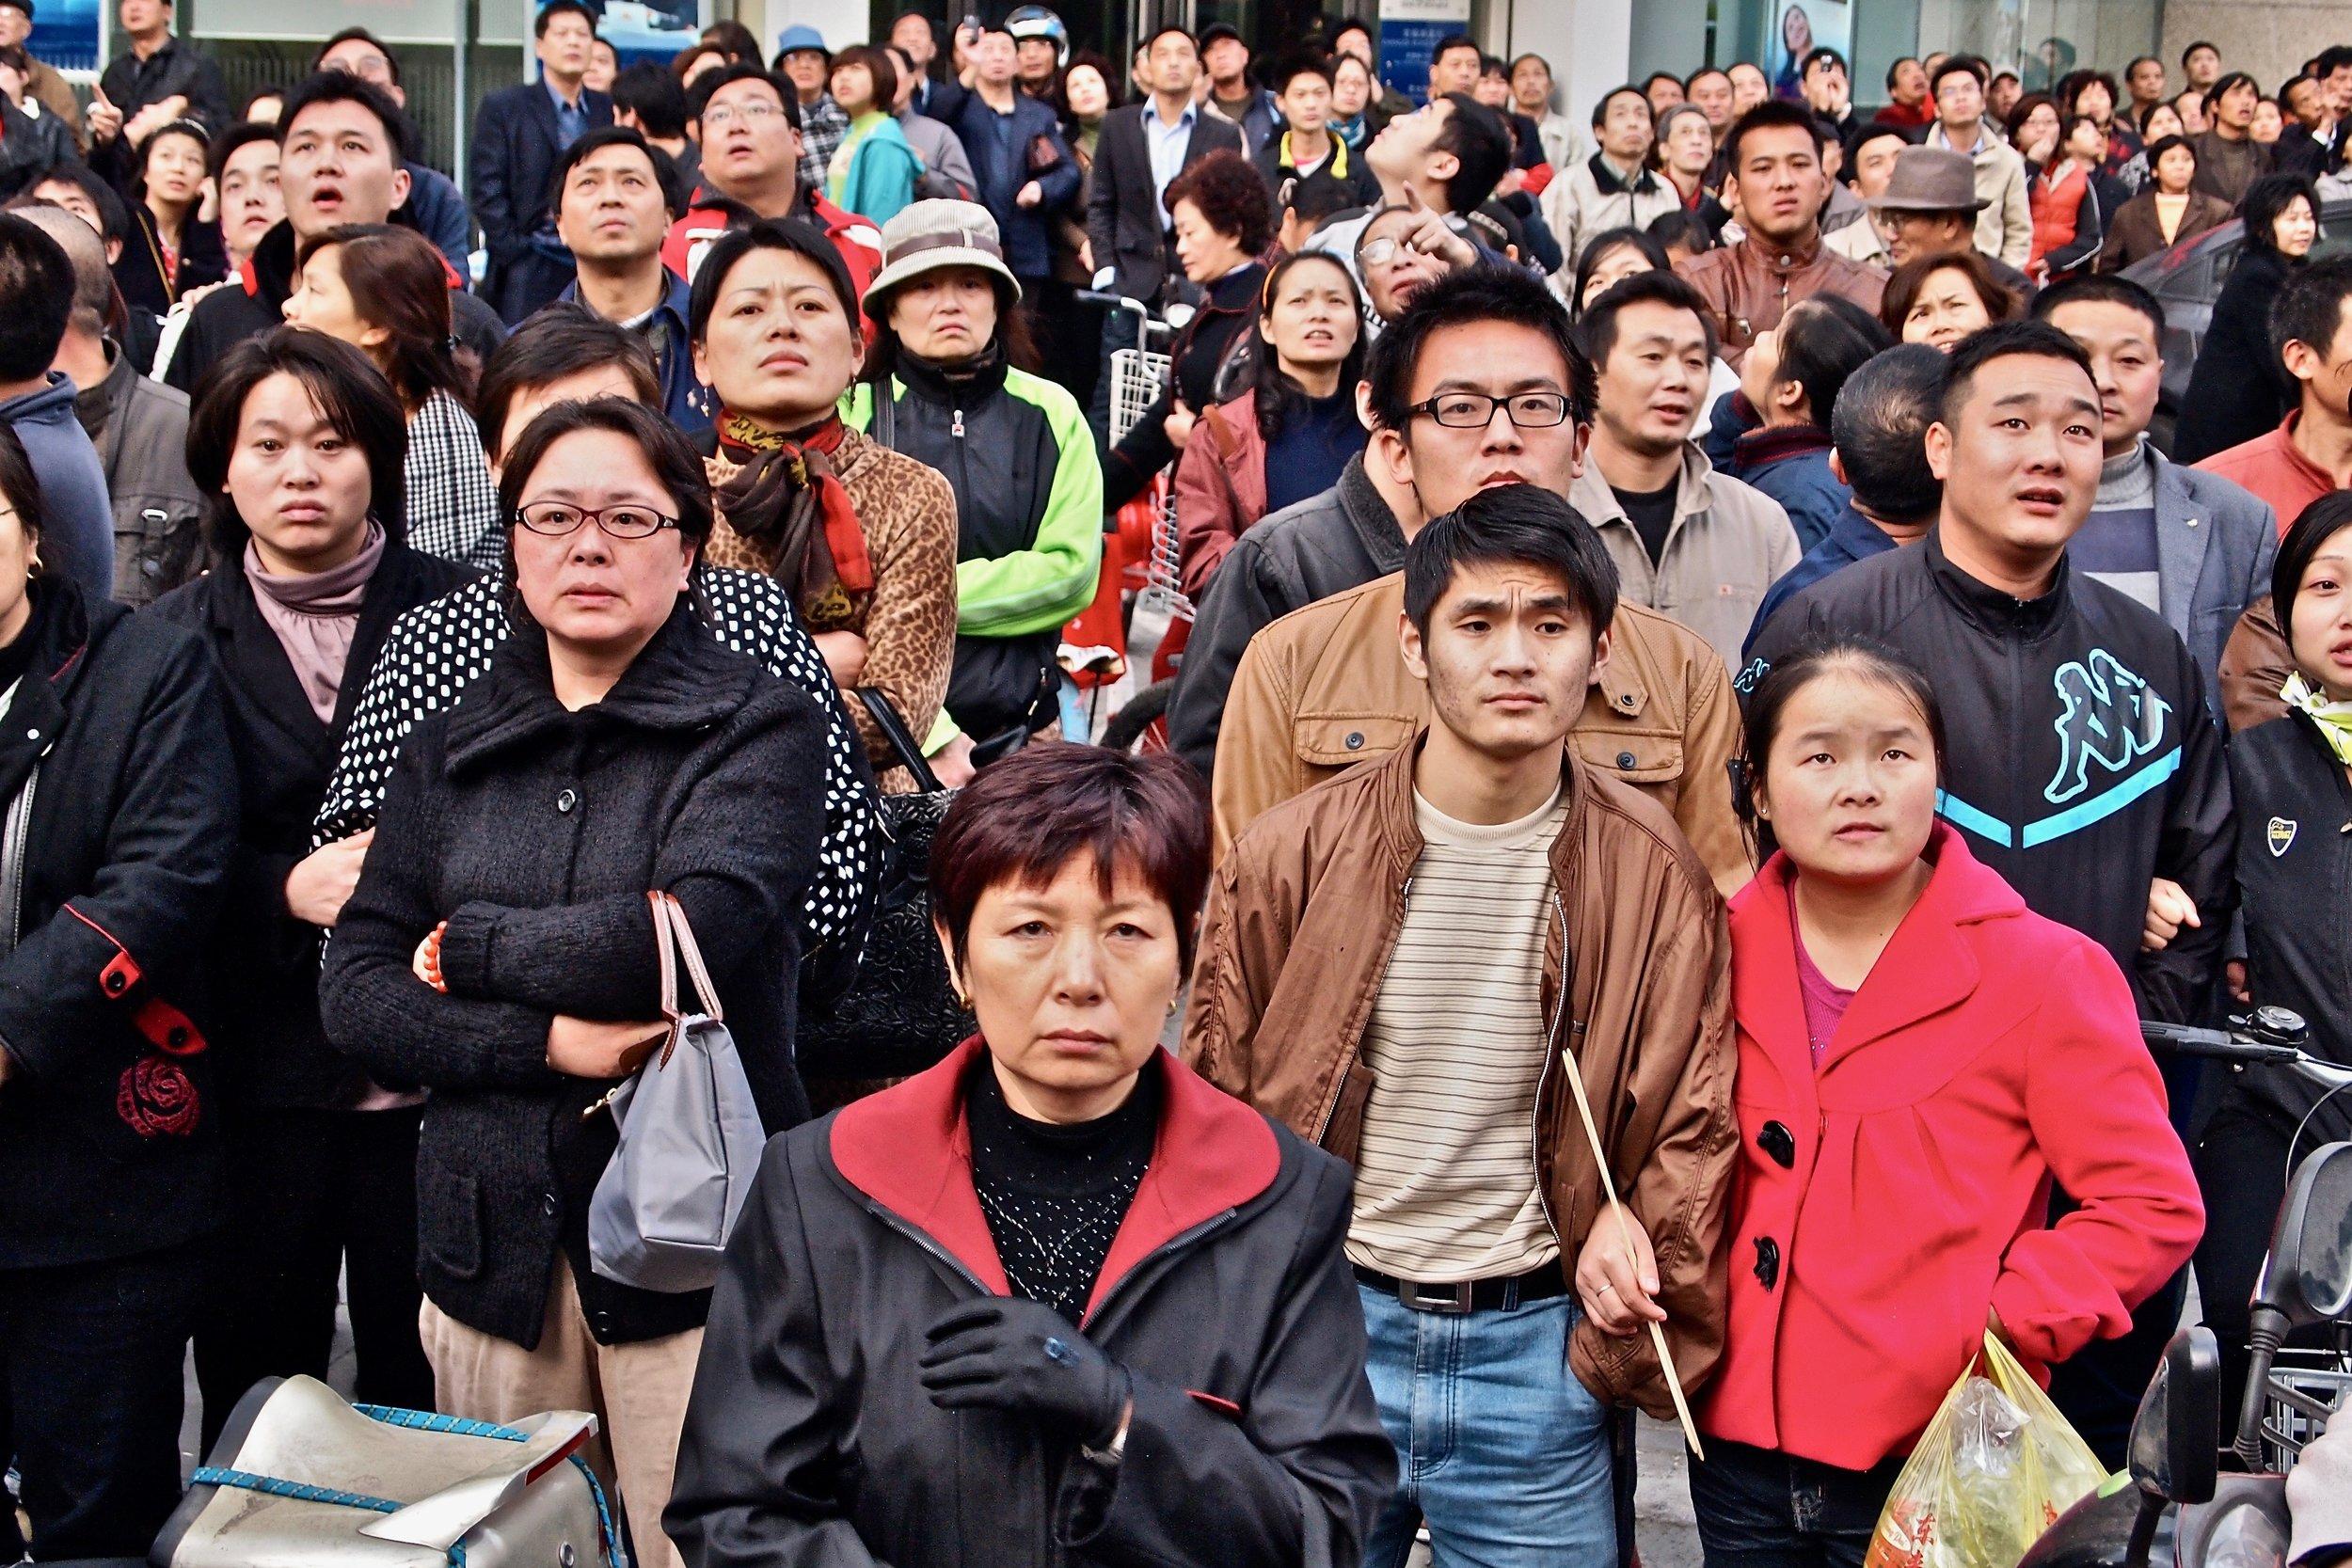 Crowd in Shanghai, China. (C) Remko Tanis